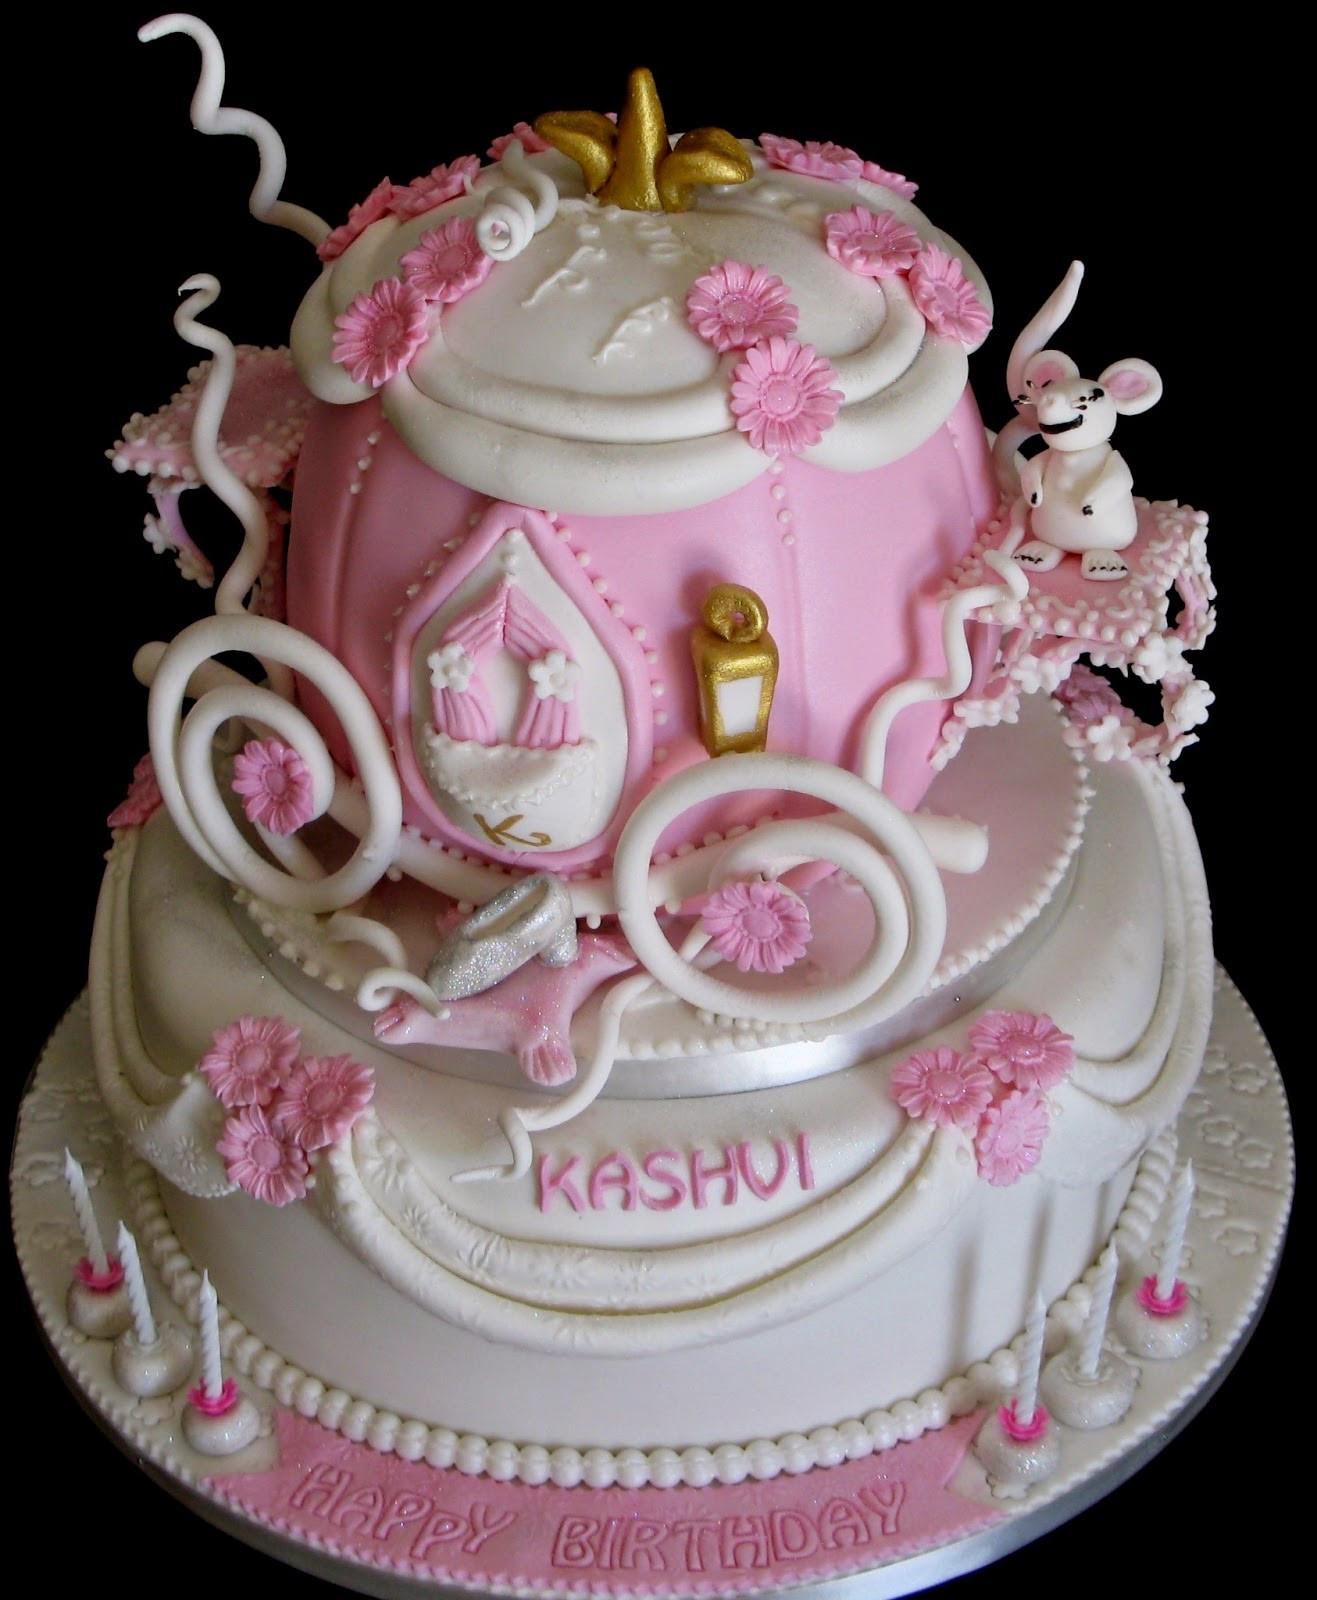 Ladies Birthday Cakes  Top 77 s Cakes For Birthday Girls